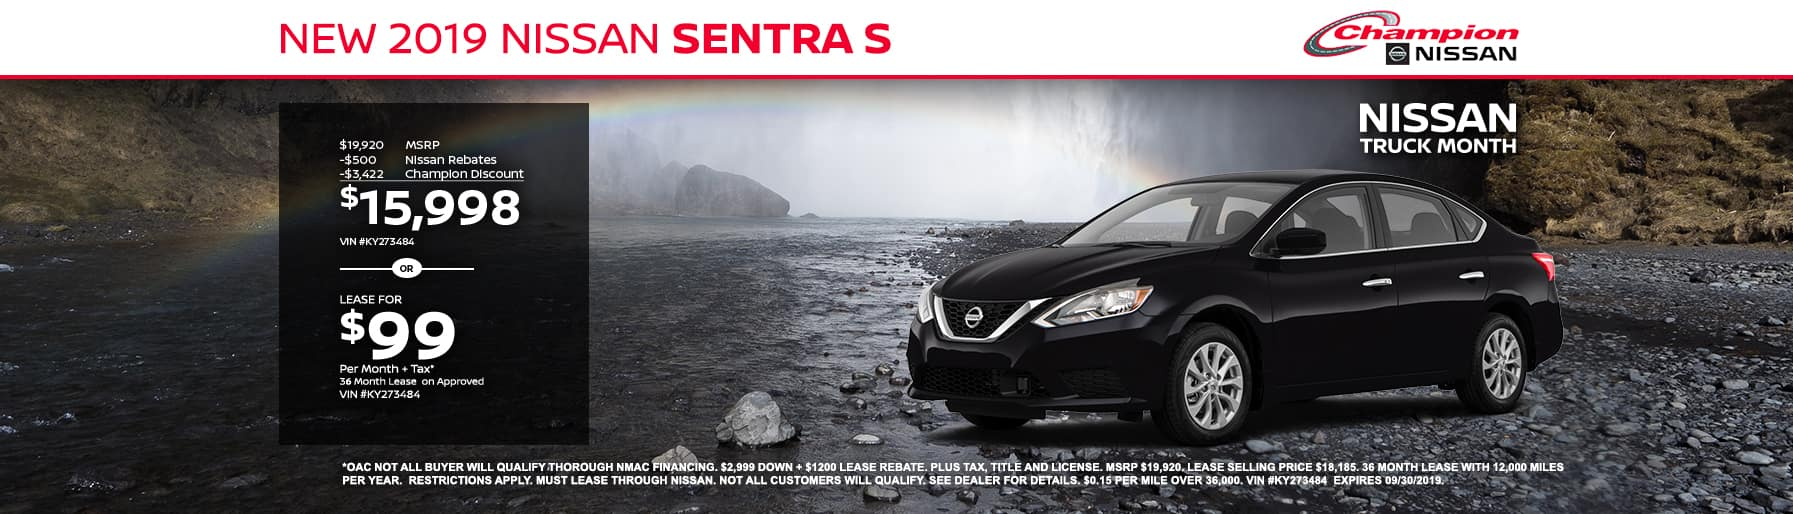 desktop TK 2019 Nissan Sentra